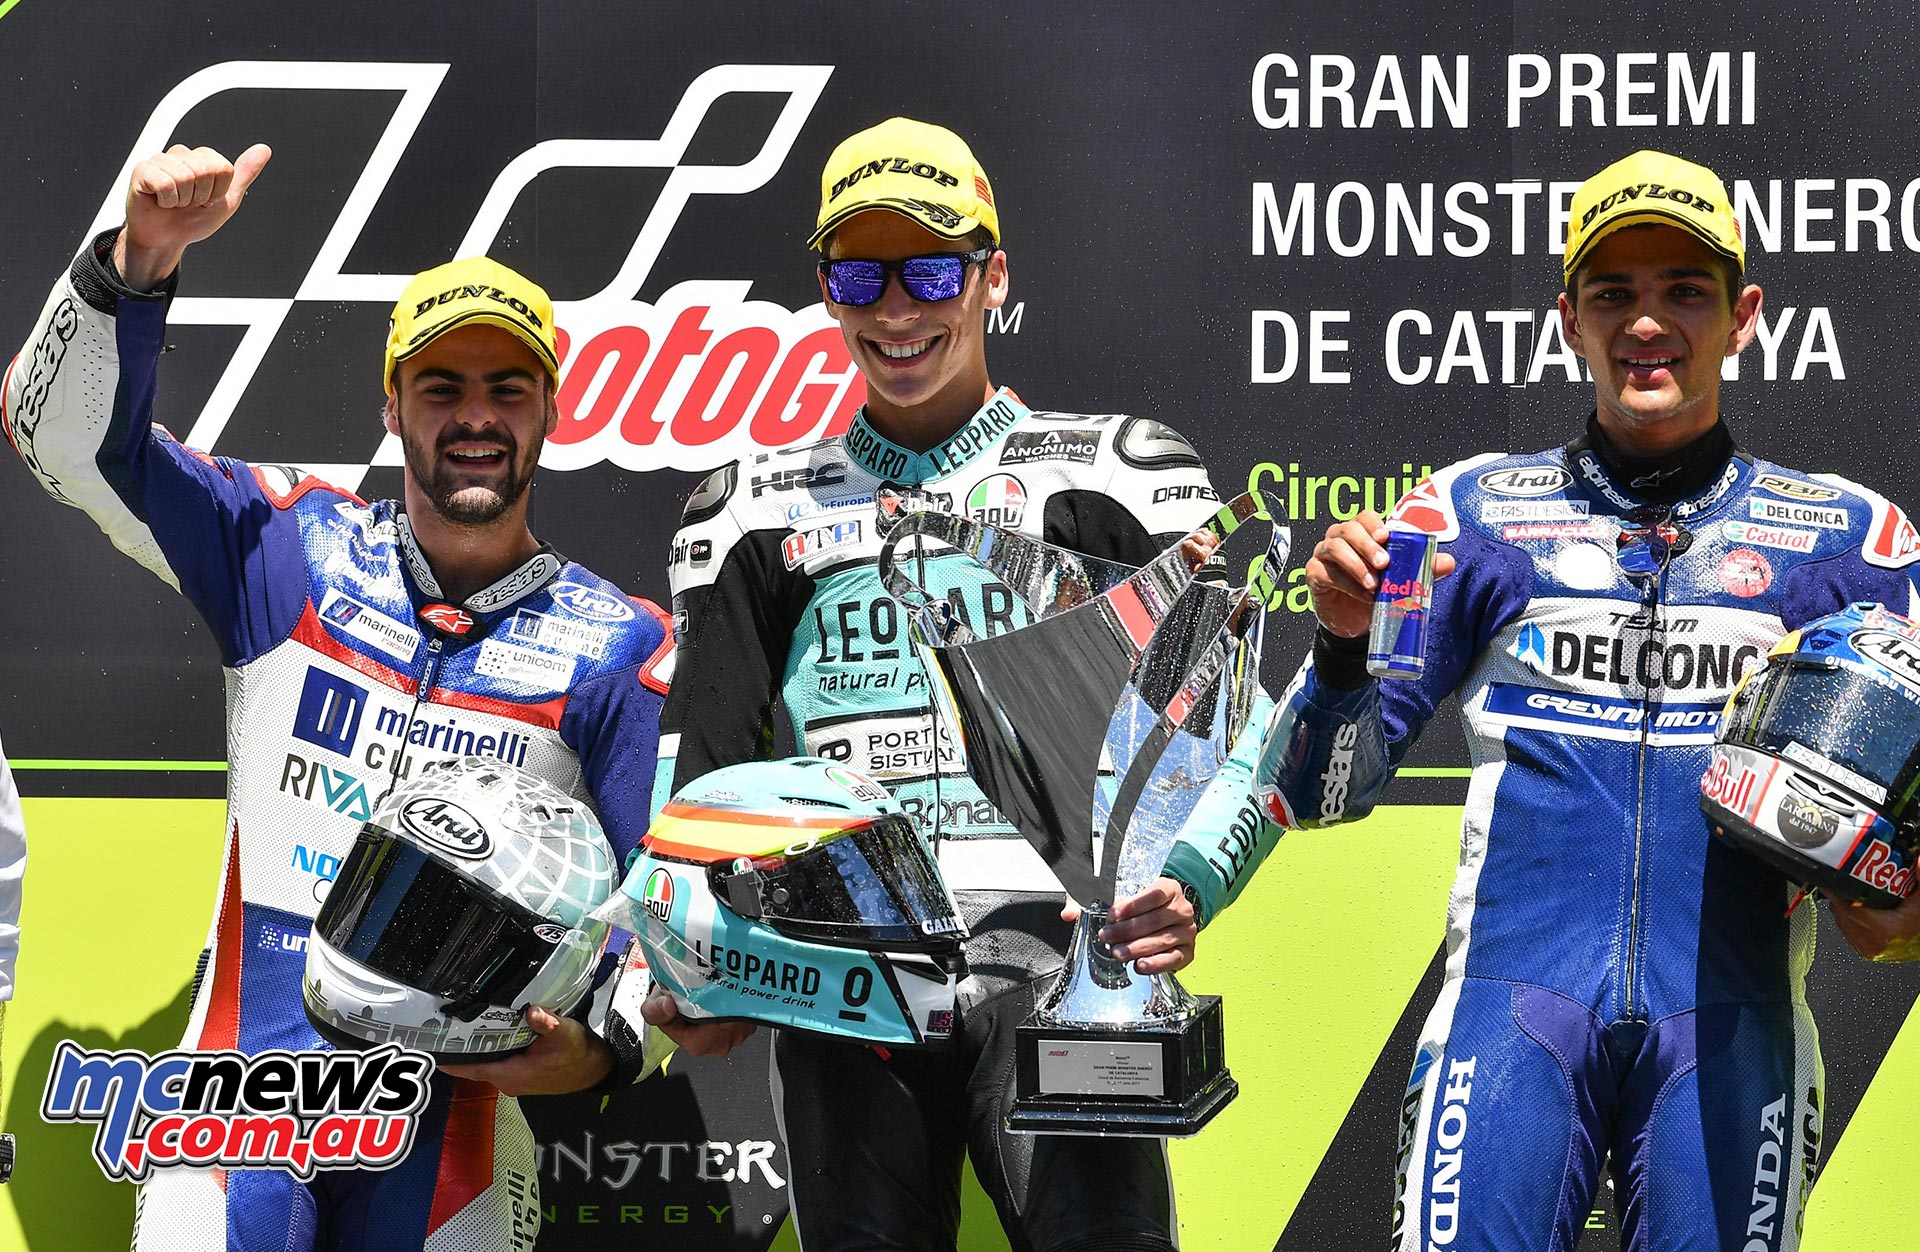 Moto3 Race Results Joan Mir (SPA - Honda) 42'11.846 Romano Fenati (ITA - Honda) + 0.191 Jorge Martín (SPA - Honda + 0.279